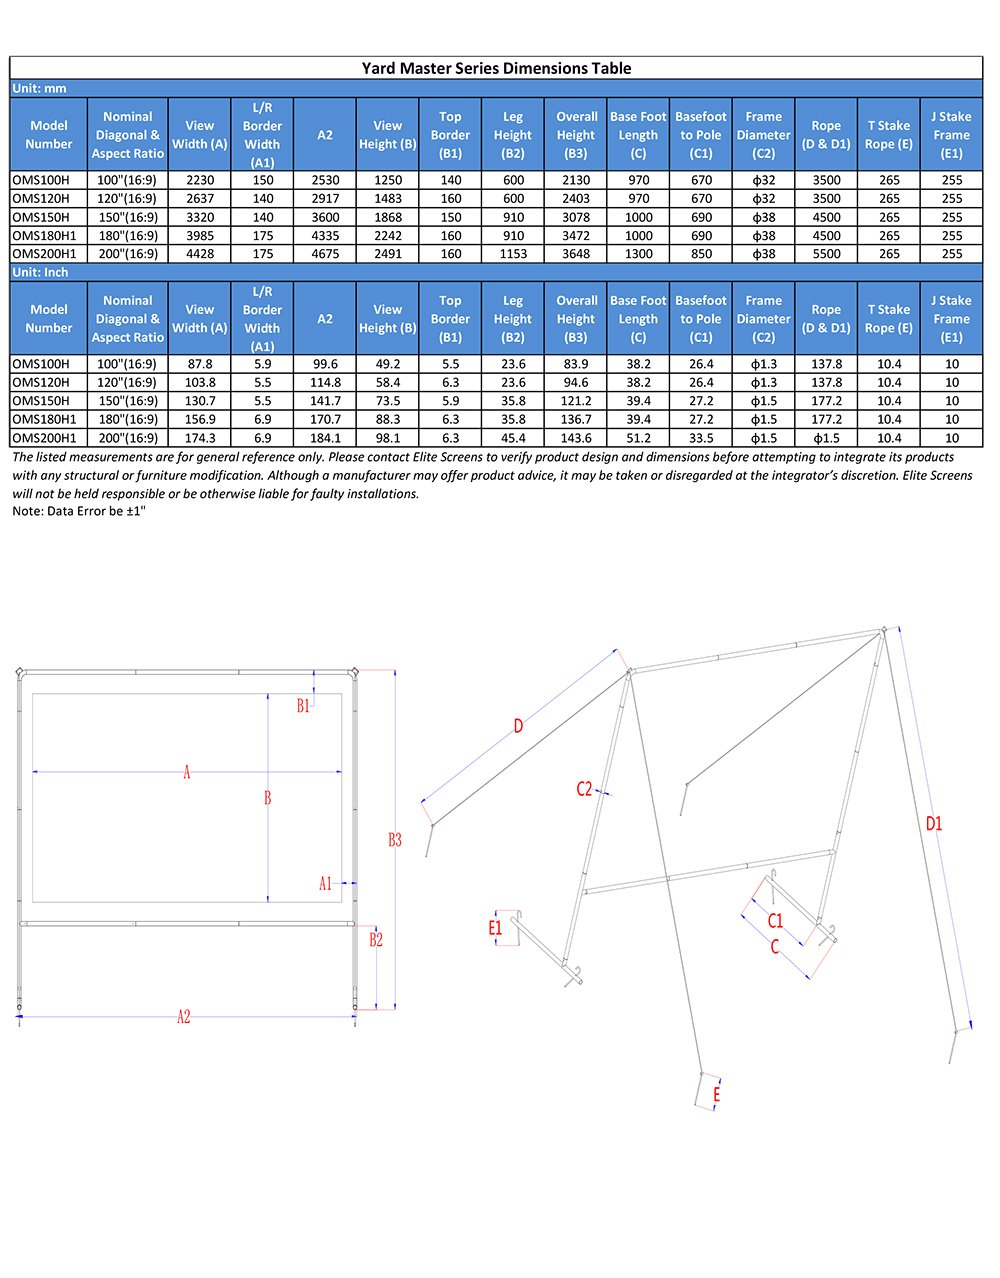 amazon com elite screens yard master series 200 in 16 9